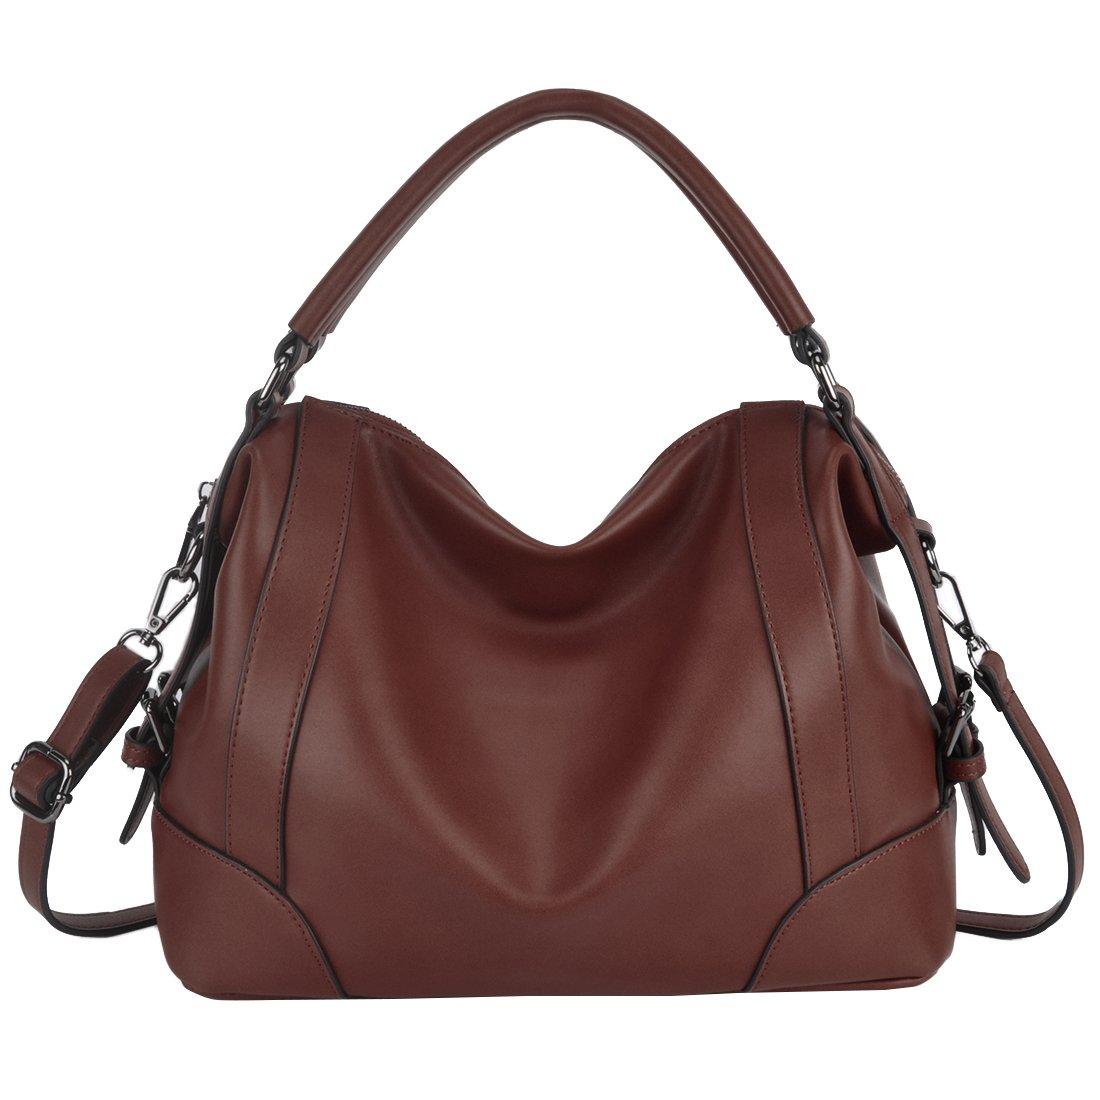 Ladies Handbags,ZMSnow Top Handle Fashion Purses Crossbody Bags for Women Girls (3.Coffee)